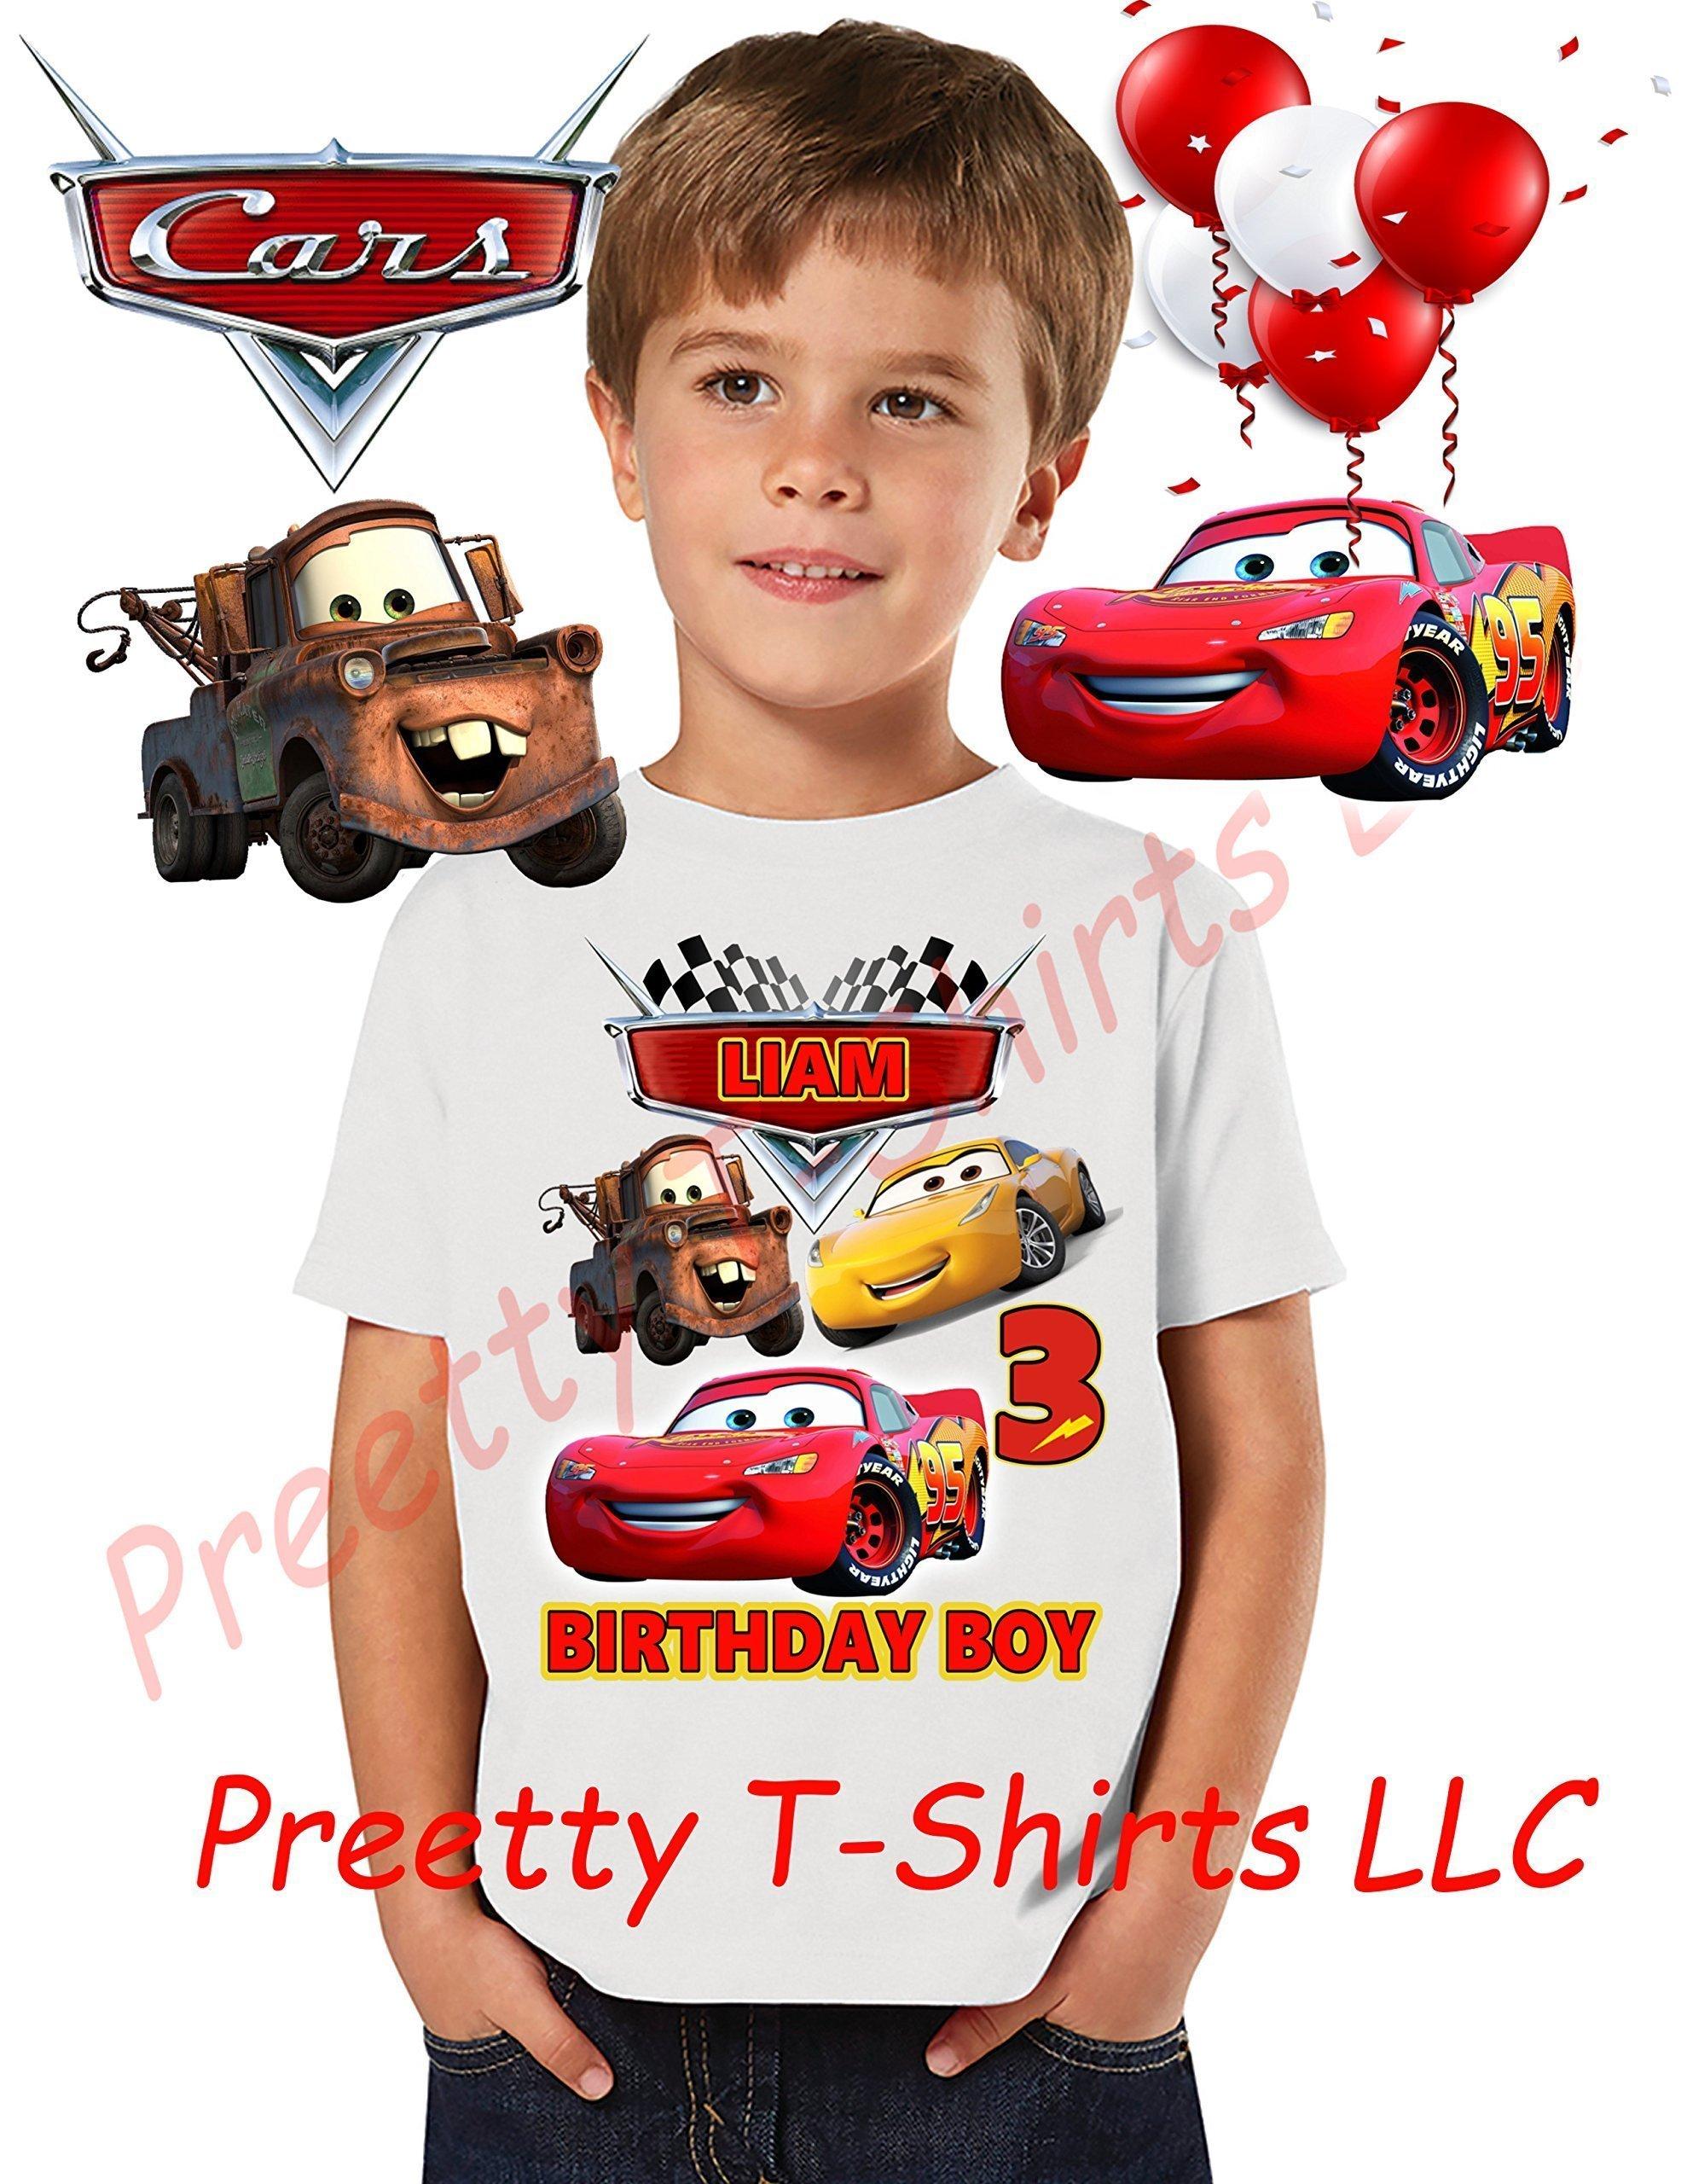 Cars Birthday Shirt, ADD any name & ANY age, Birthday Boy Shirt, Cars FAMILY Matching Shirts, Cars, Lightning McQueen shirts, Cars Shirts, VISIT OUR SHOP!!,